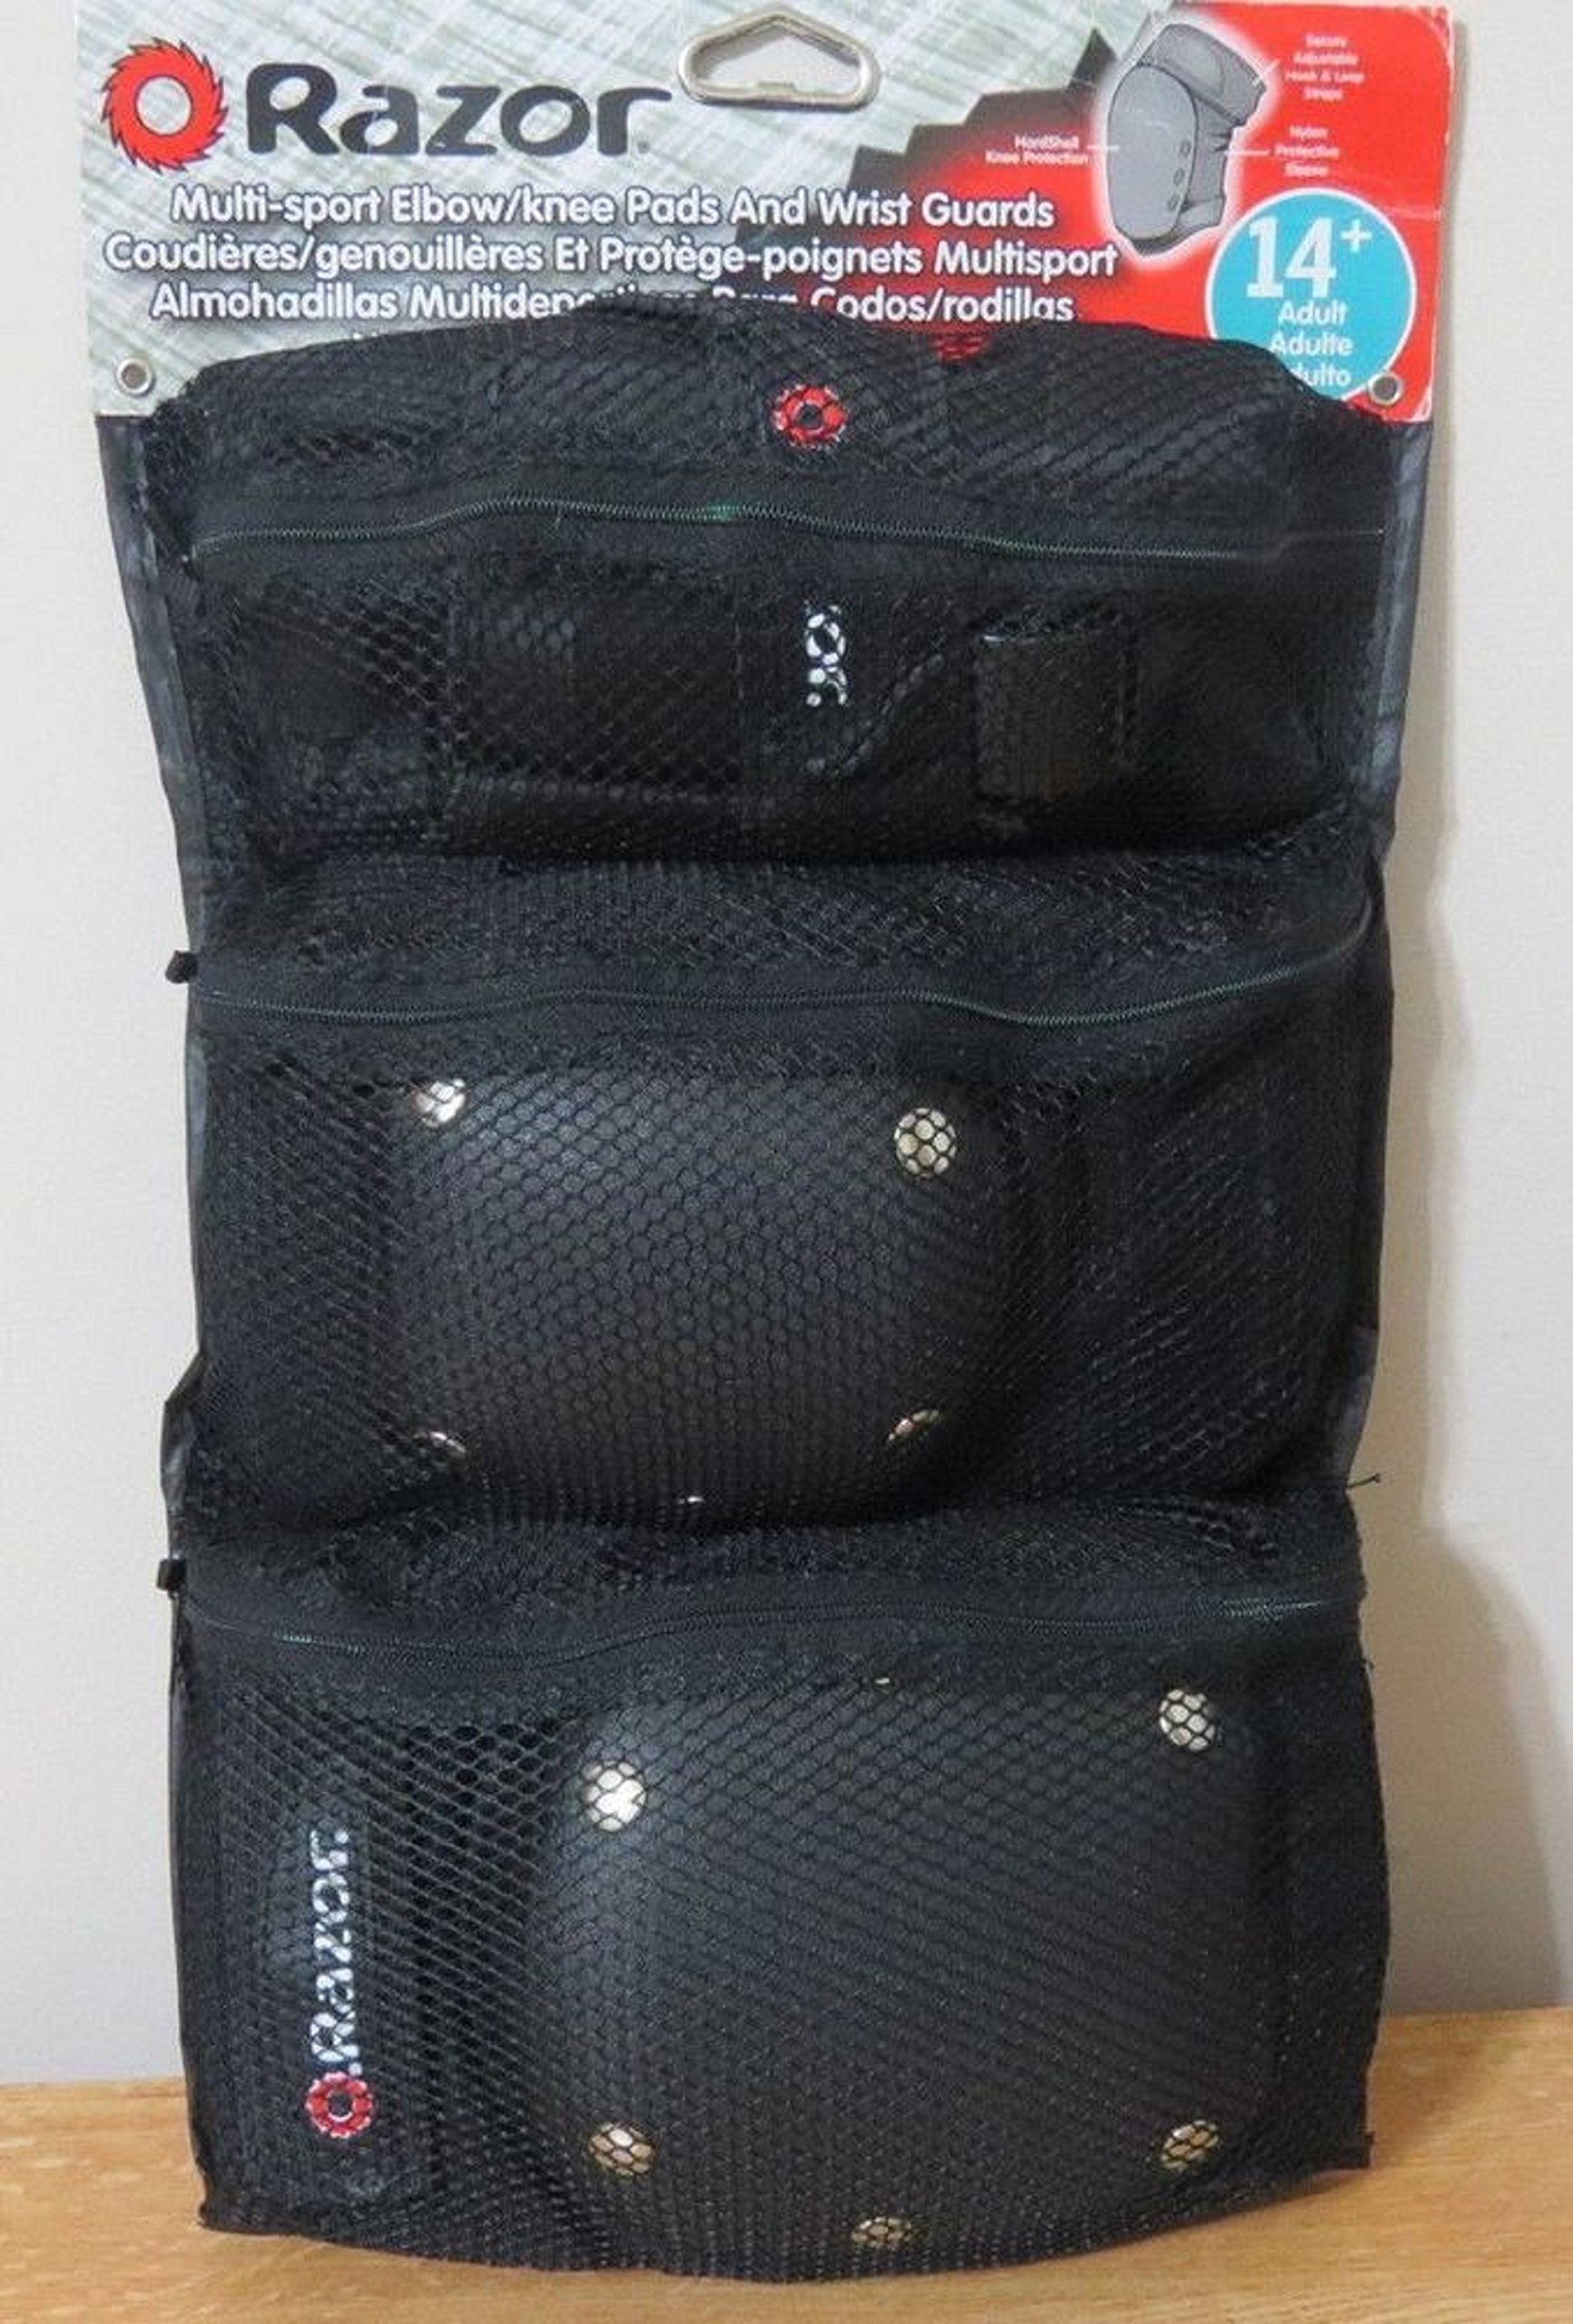 Razor Multi-sport Elbow/knee Pads and Wrist Guards 8+ - Black